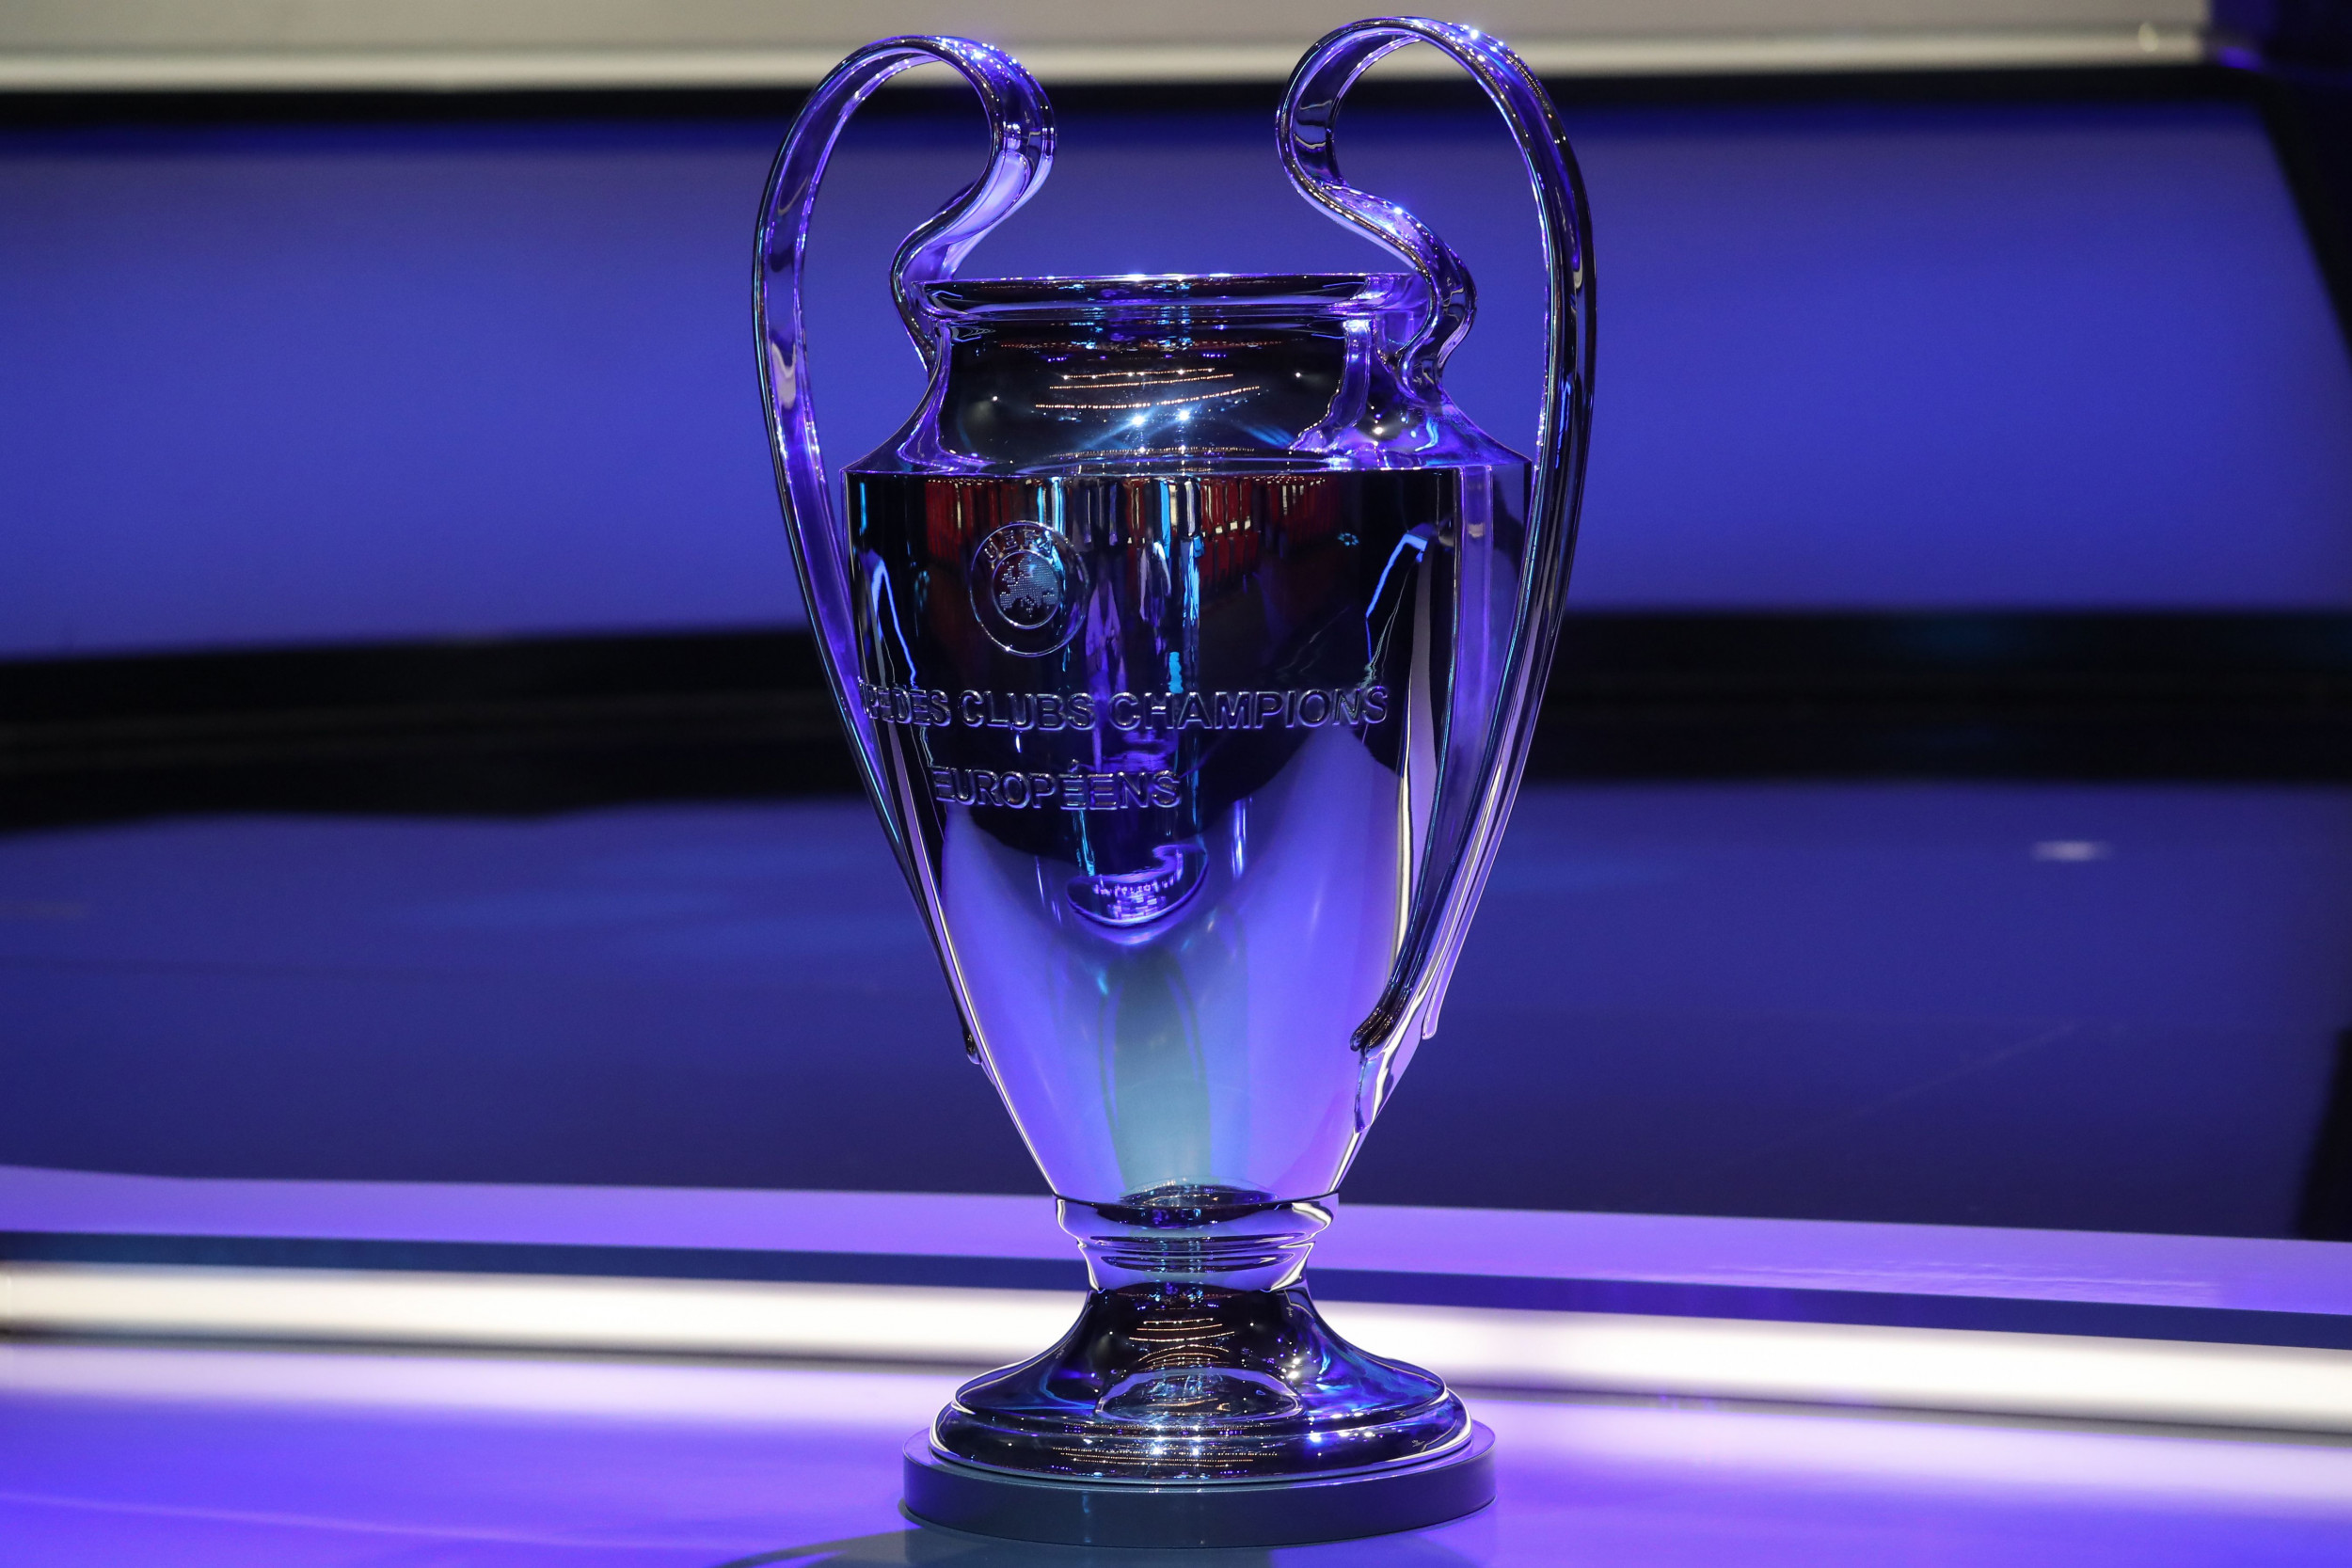 UEFA Champions League 2020: Quarterfinals Bracket, TV Schedule, Live Stream